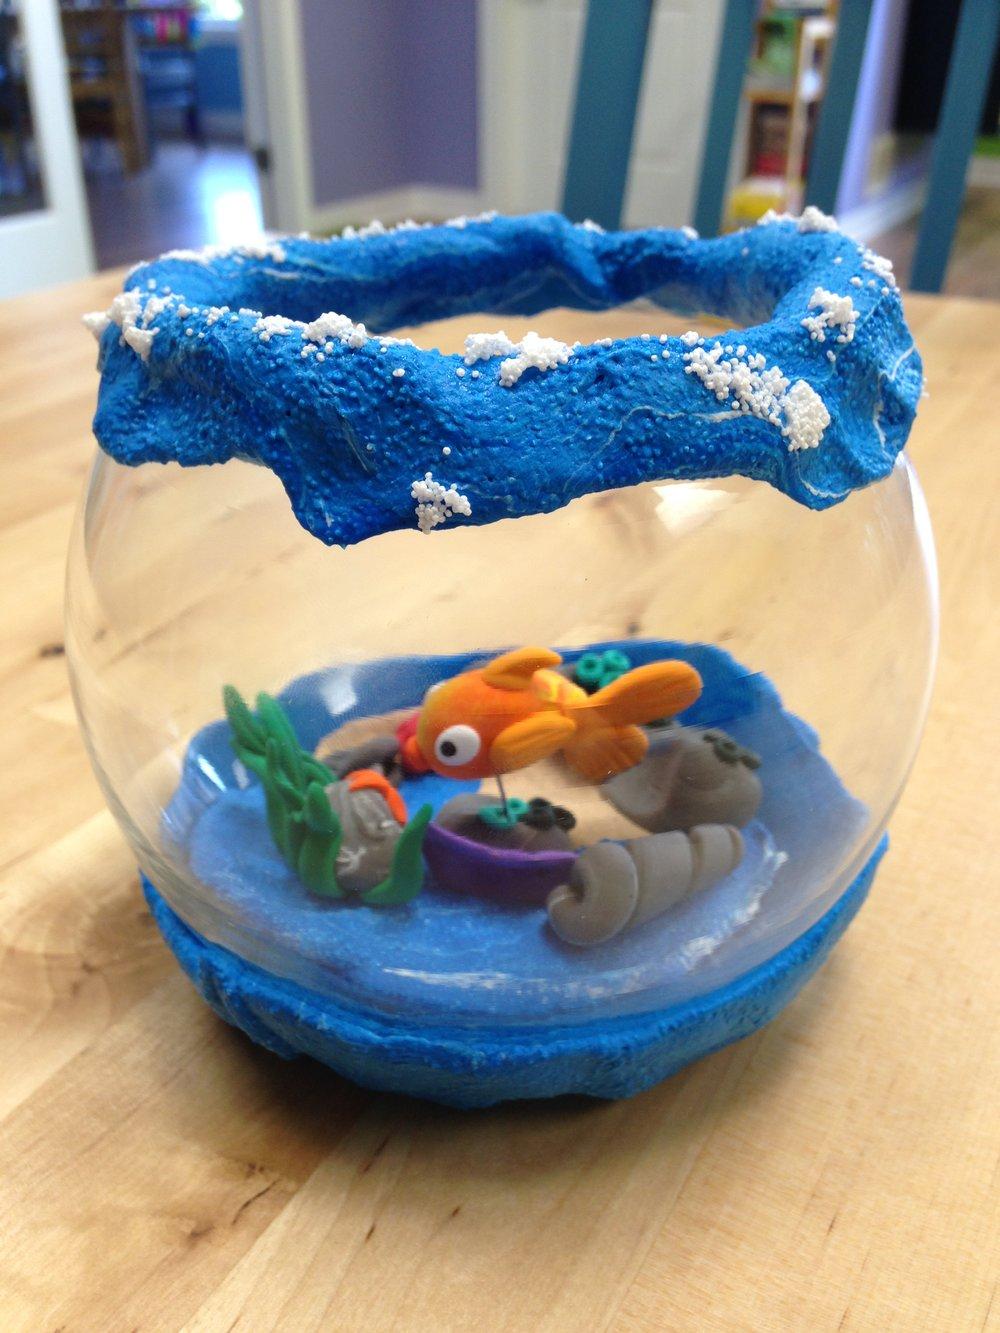 fish bowl2 (3).JPG